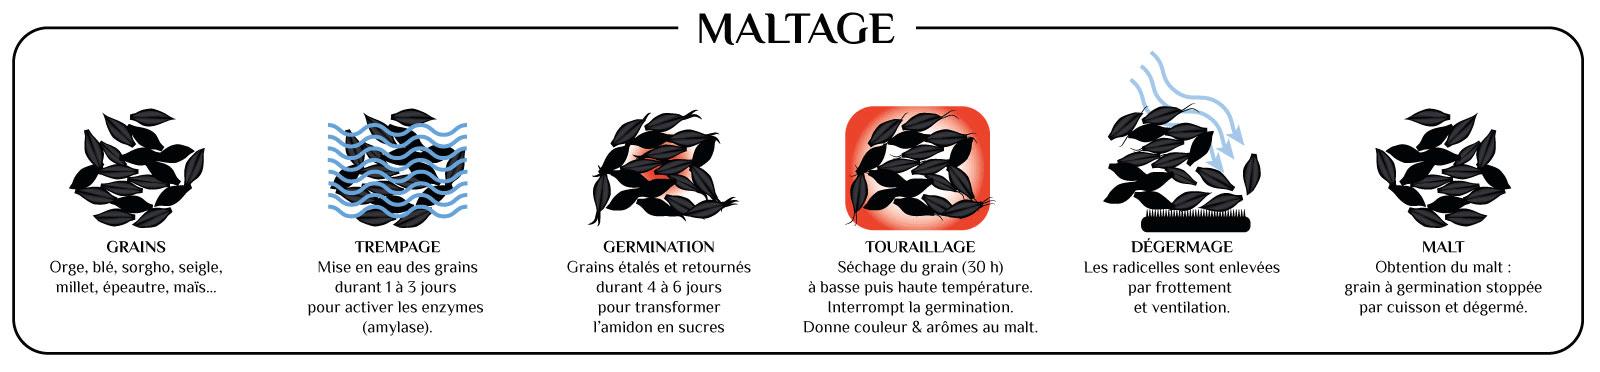 infographie-etapes-maltage